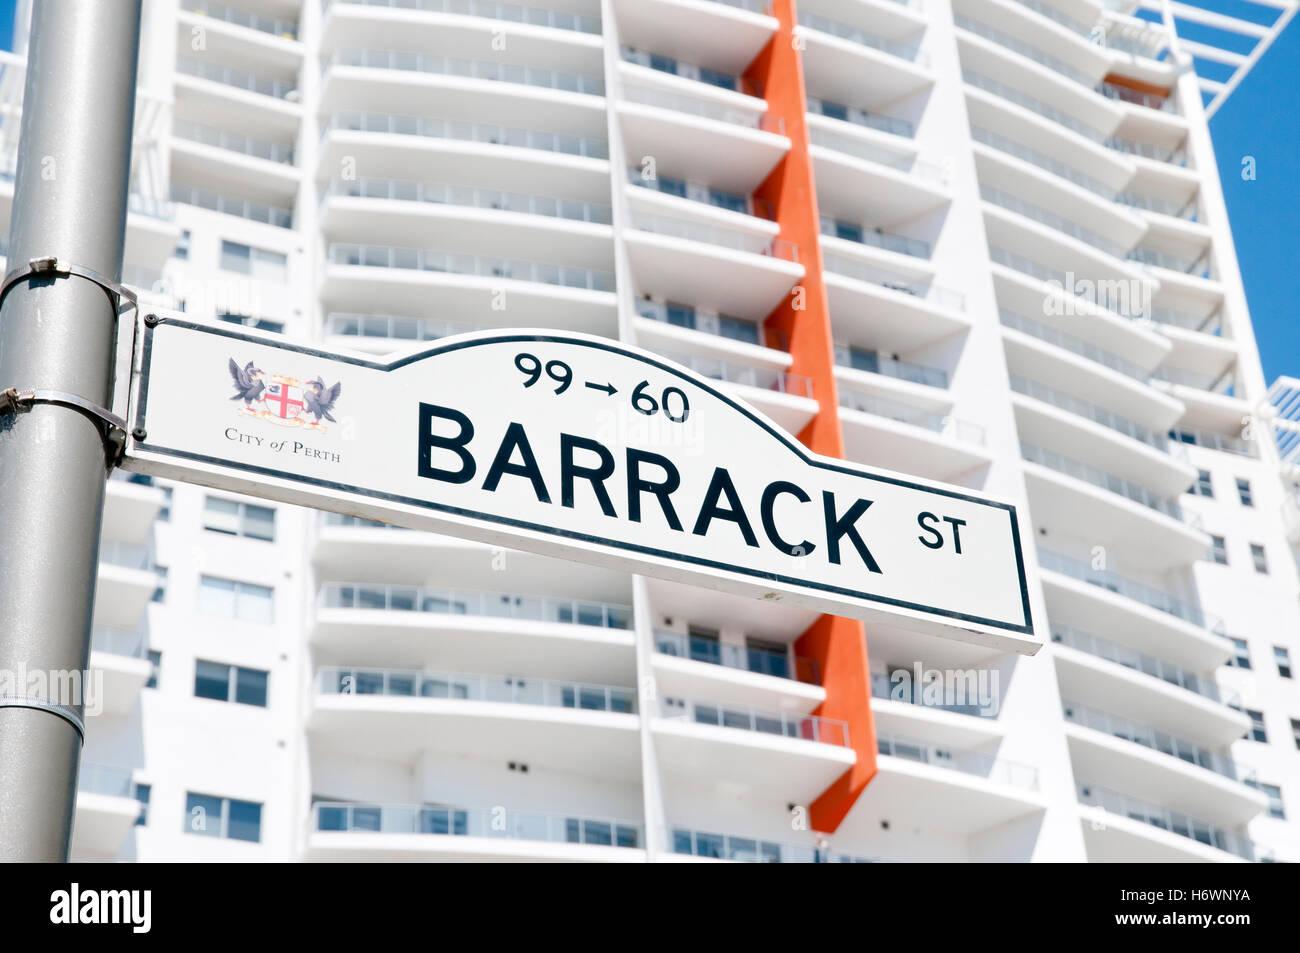 Barrack Street Sign - Perth - Australia - Stock Image